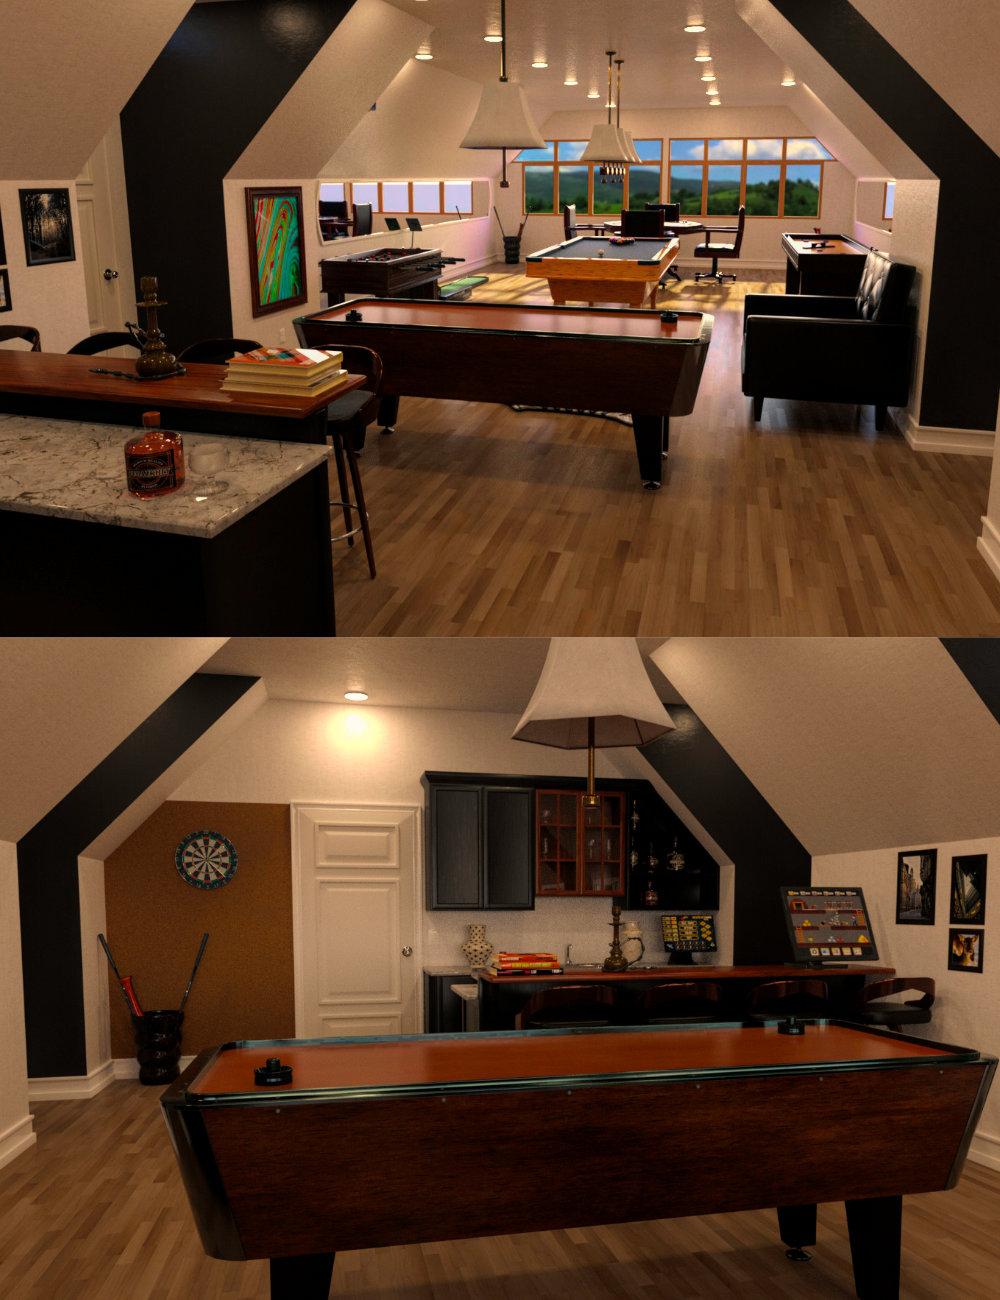 FG Entertainment Room by: Fugazi1968PAN StudiosIronman, 3D Models by Daz 3D